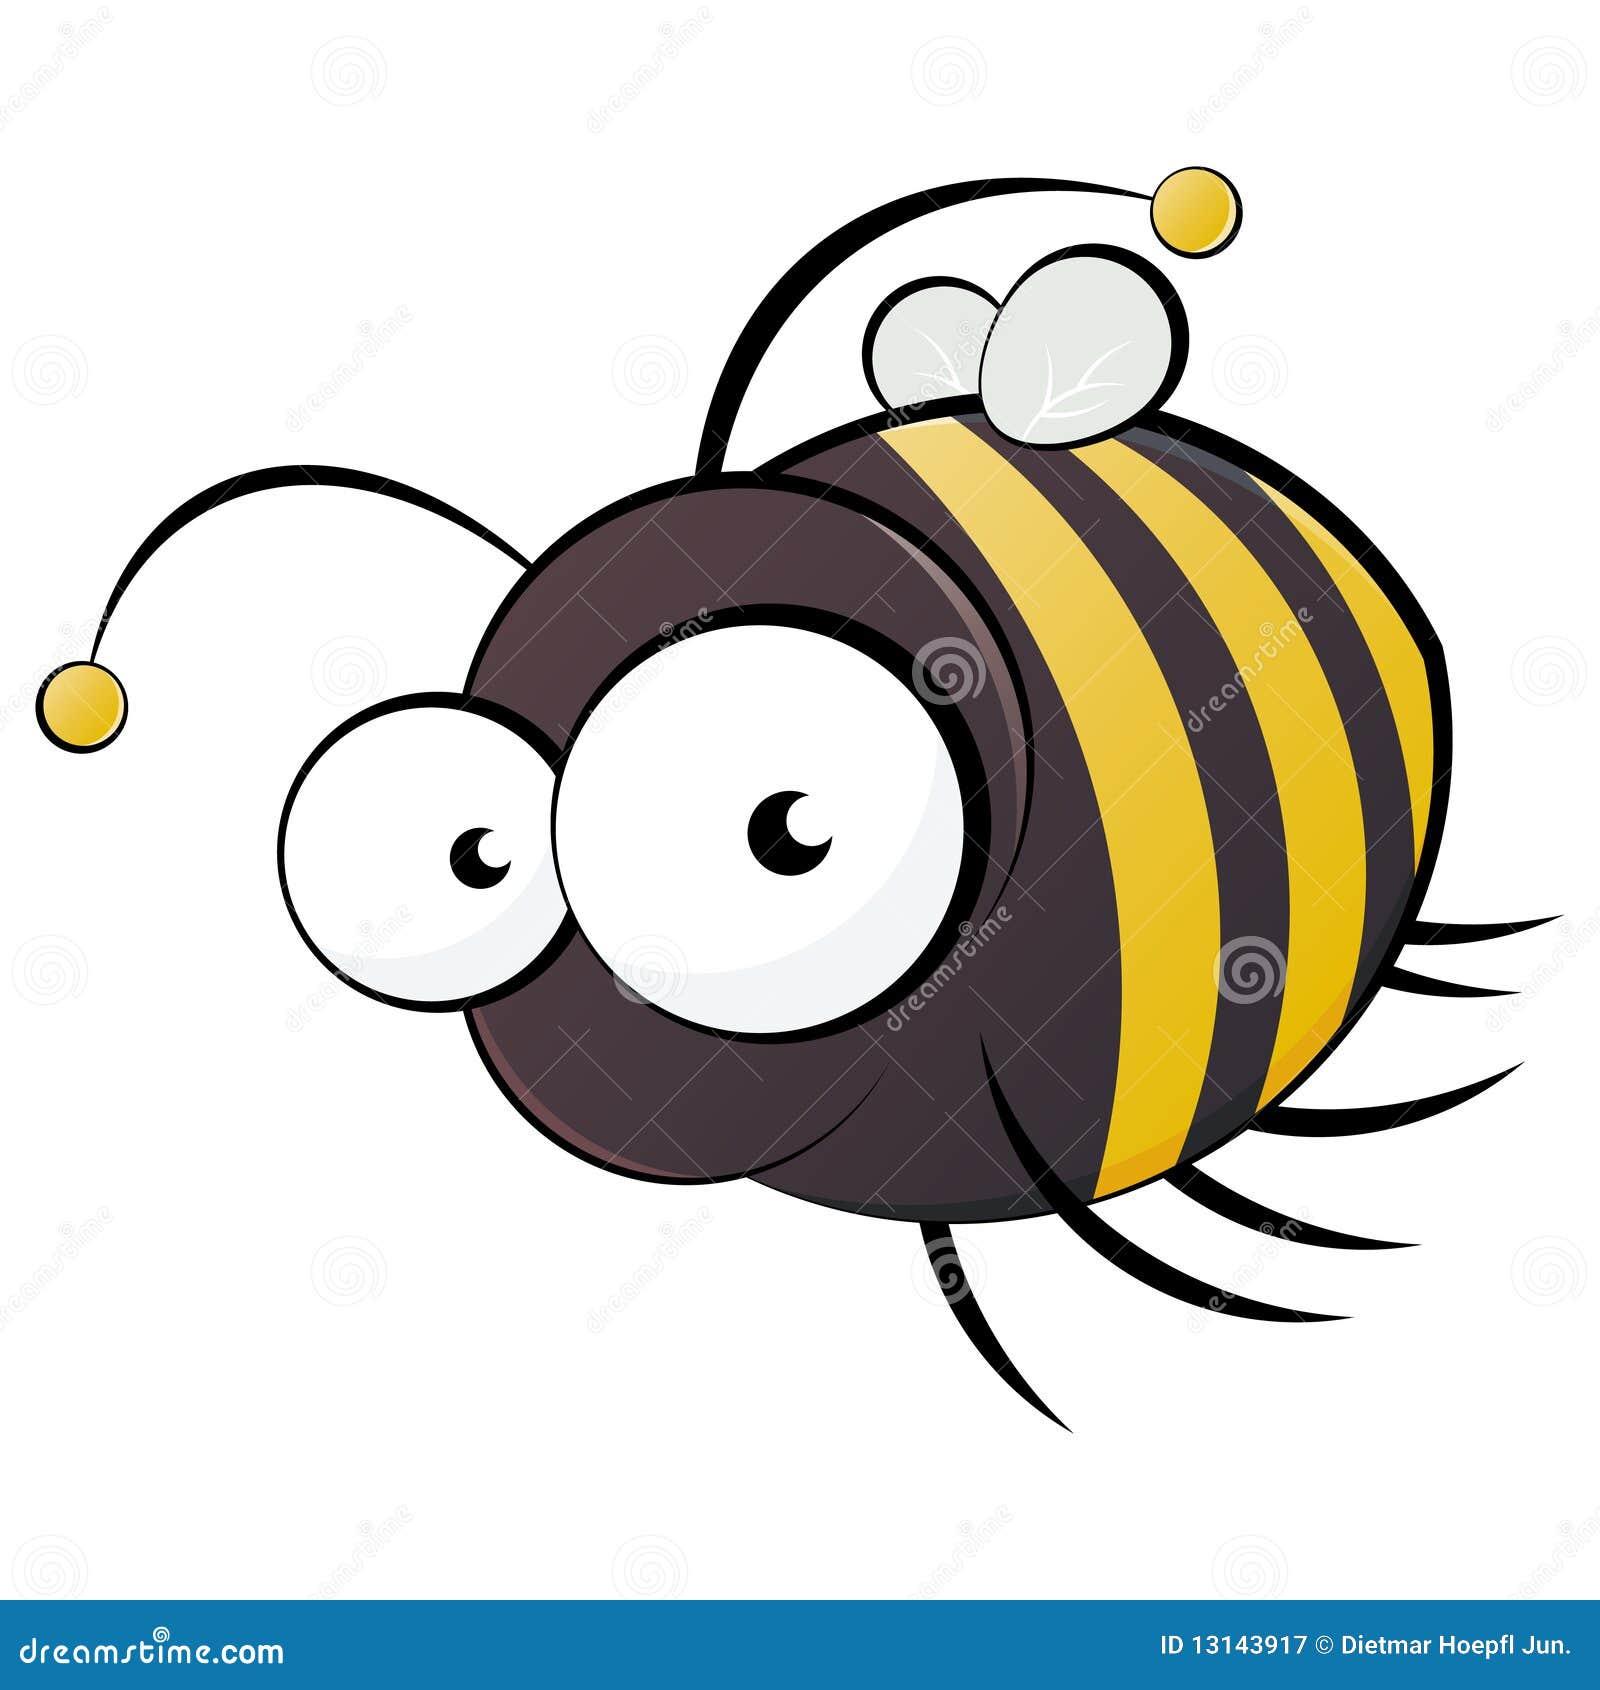 Bee Cartoon Royalty Free Stock Photography - Image: 13143917